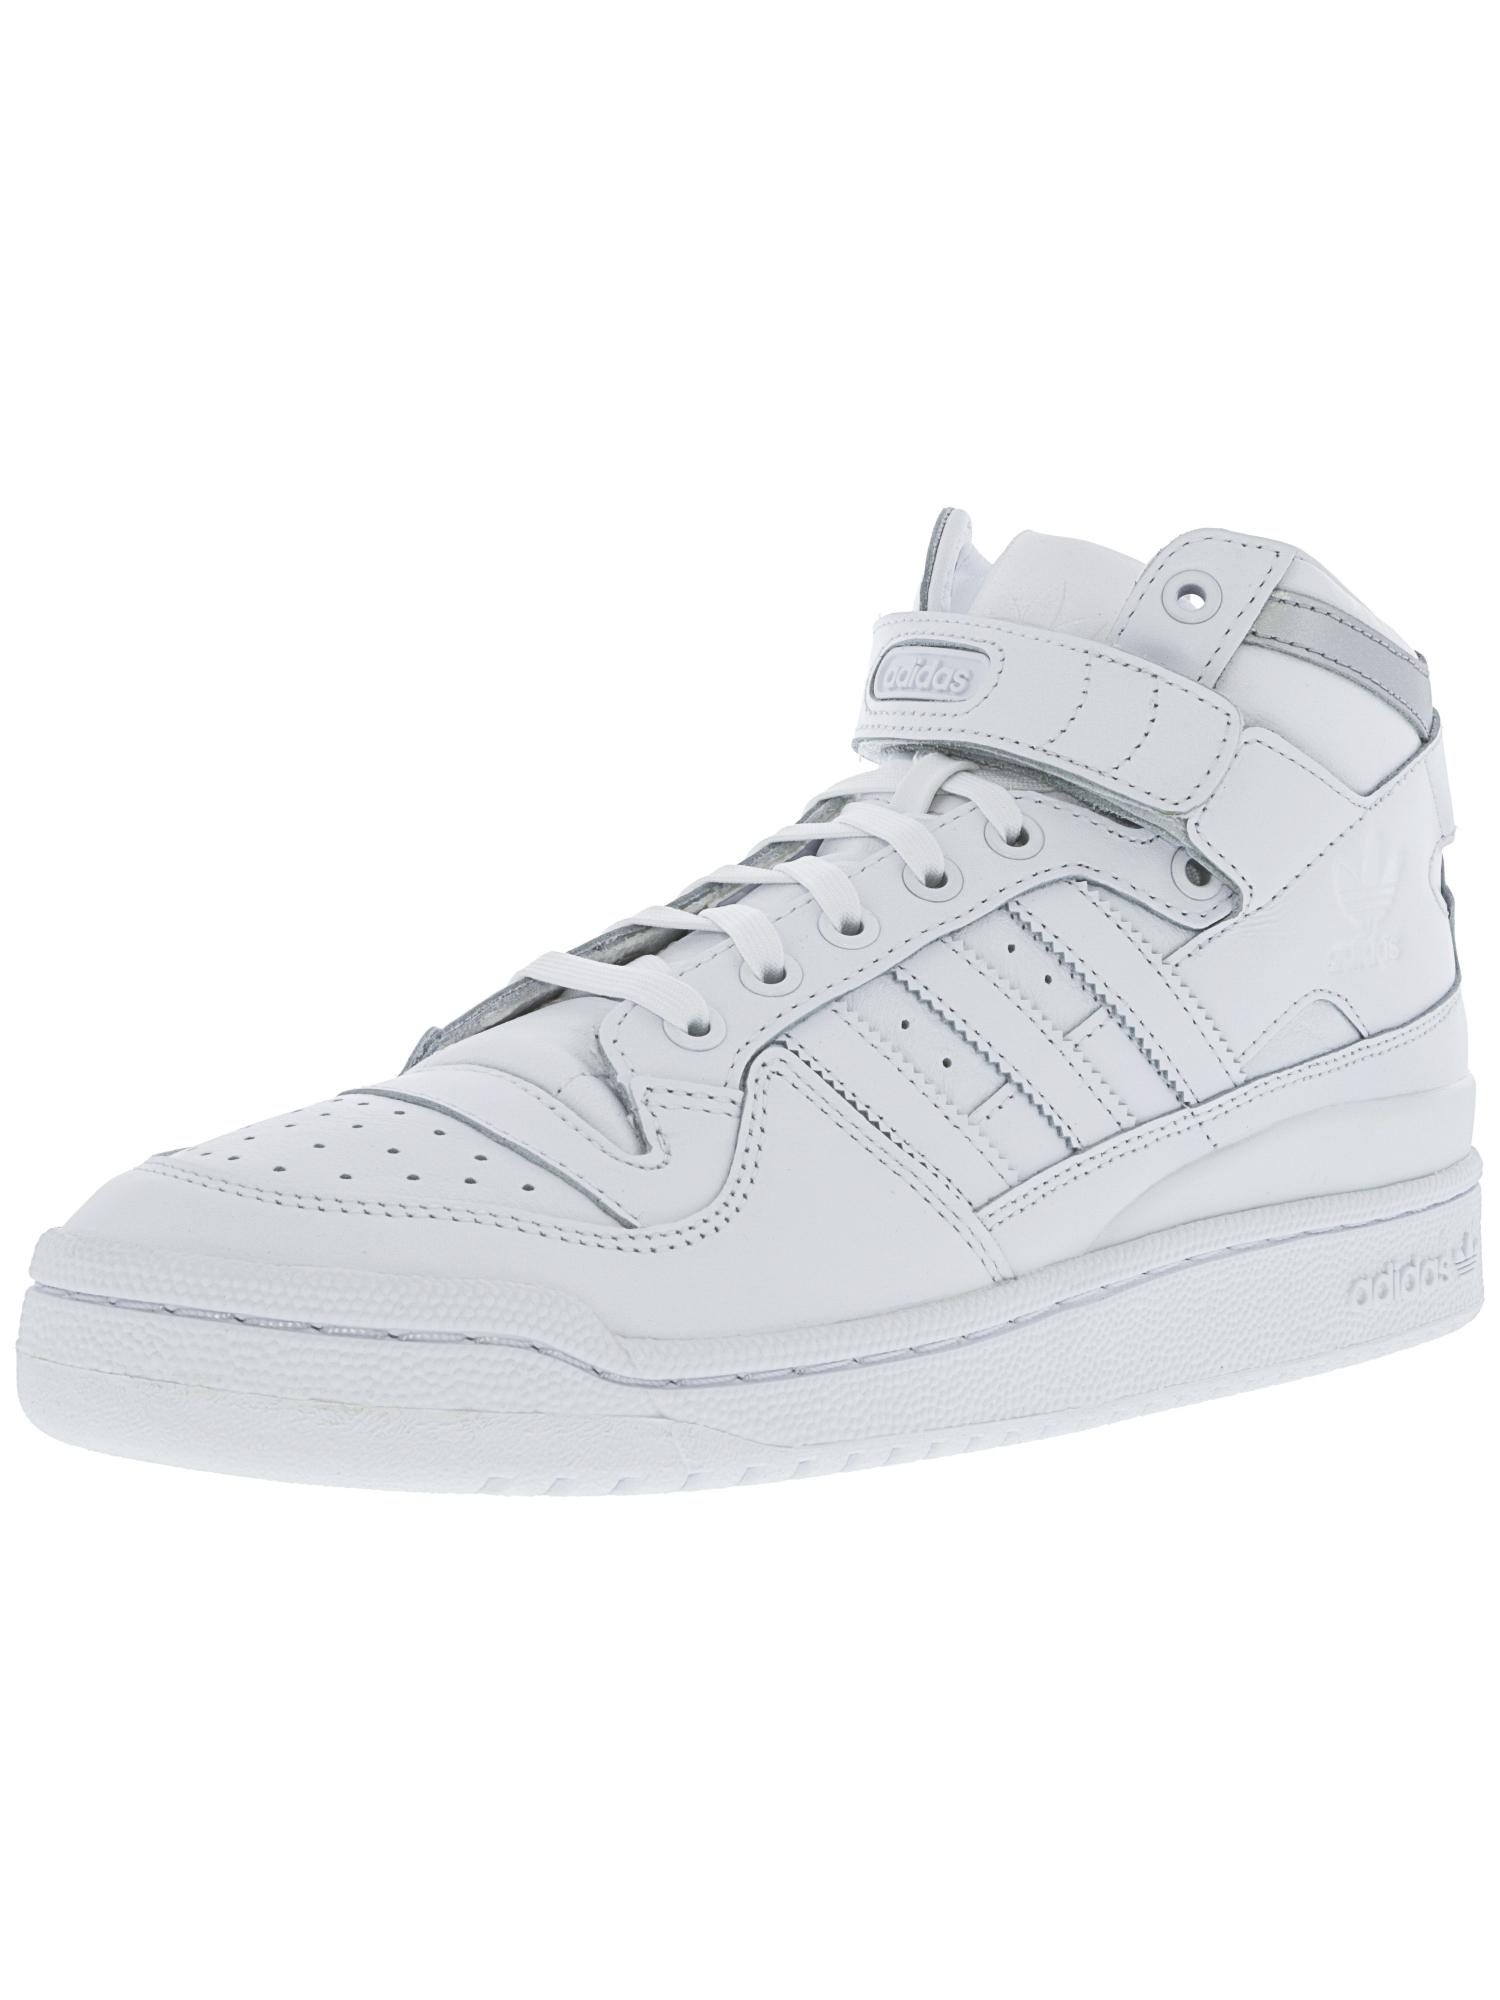 factory price 51181 0bdd5 ... best price adidas men 039 s forum mid refined mid 3d7f8 d9809